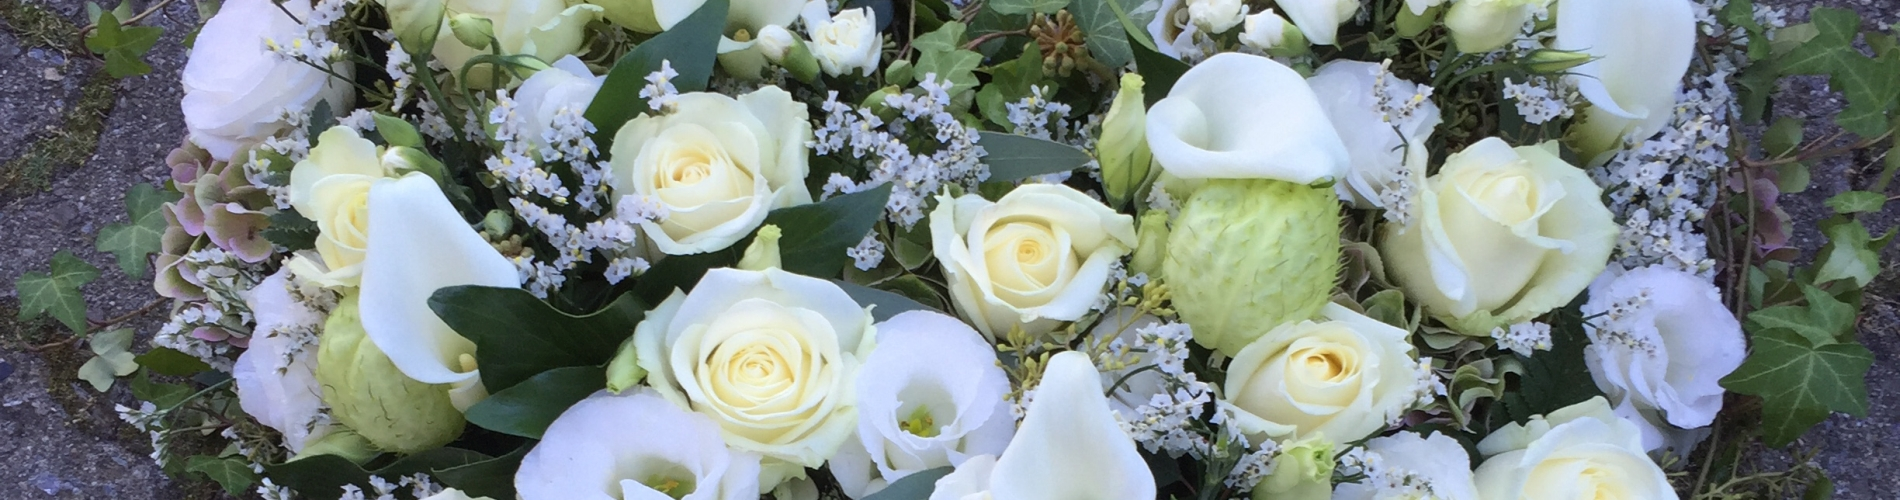 Trauerfloristik - Blumento in Berikon